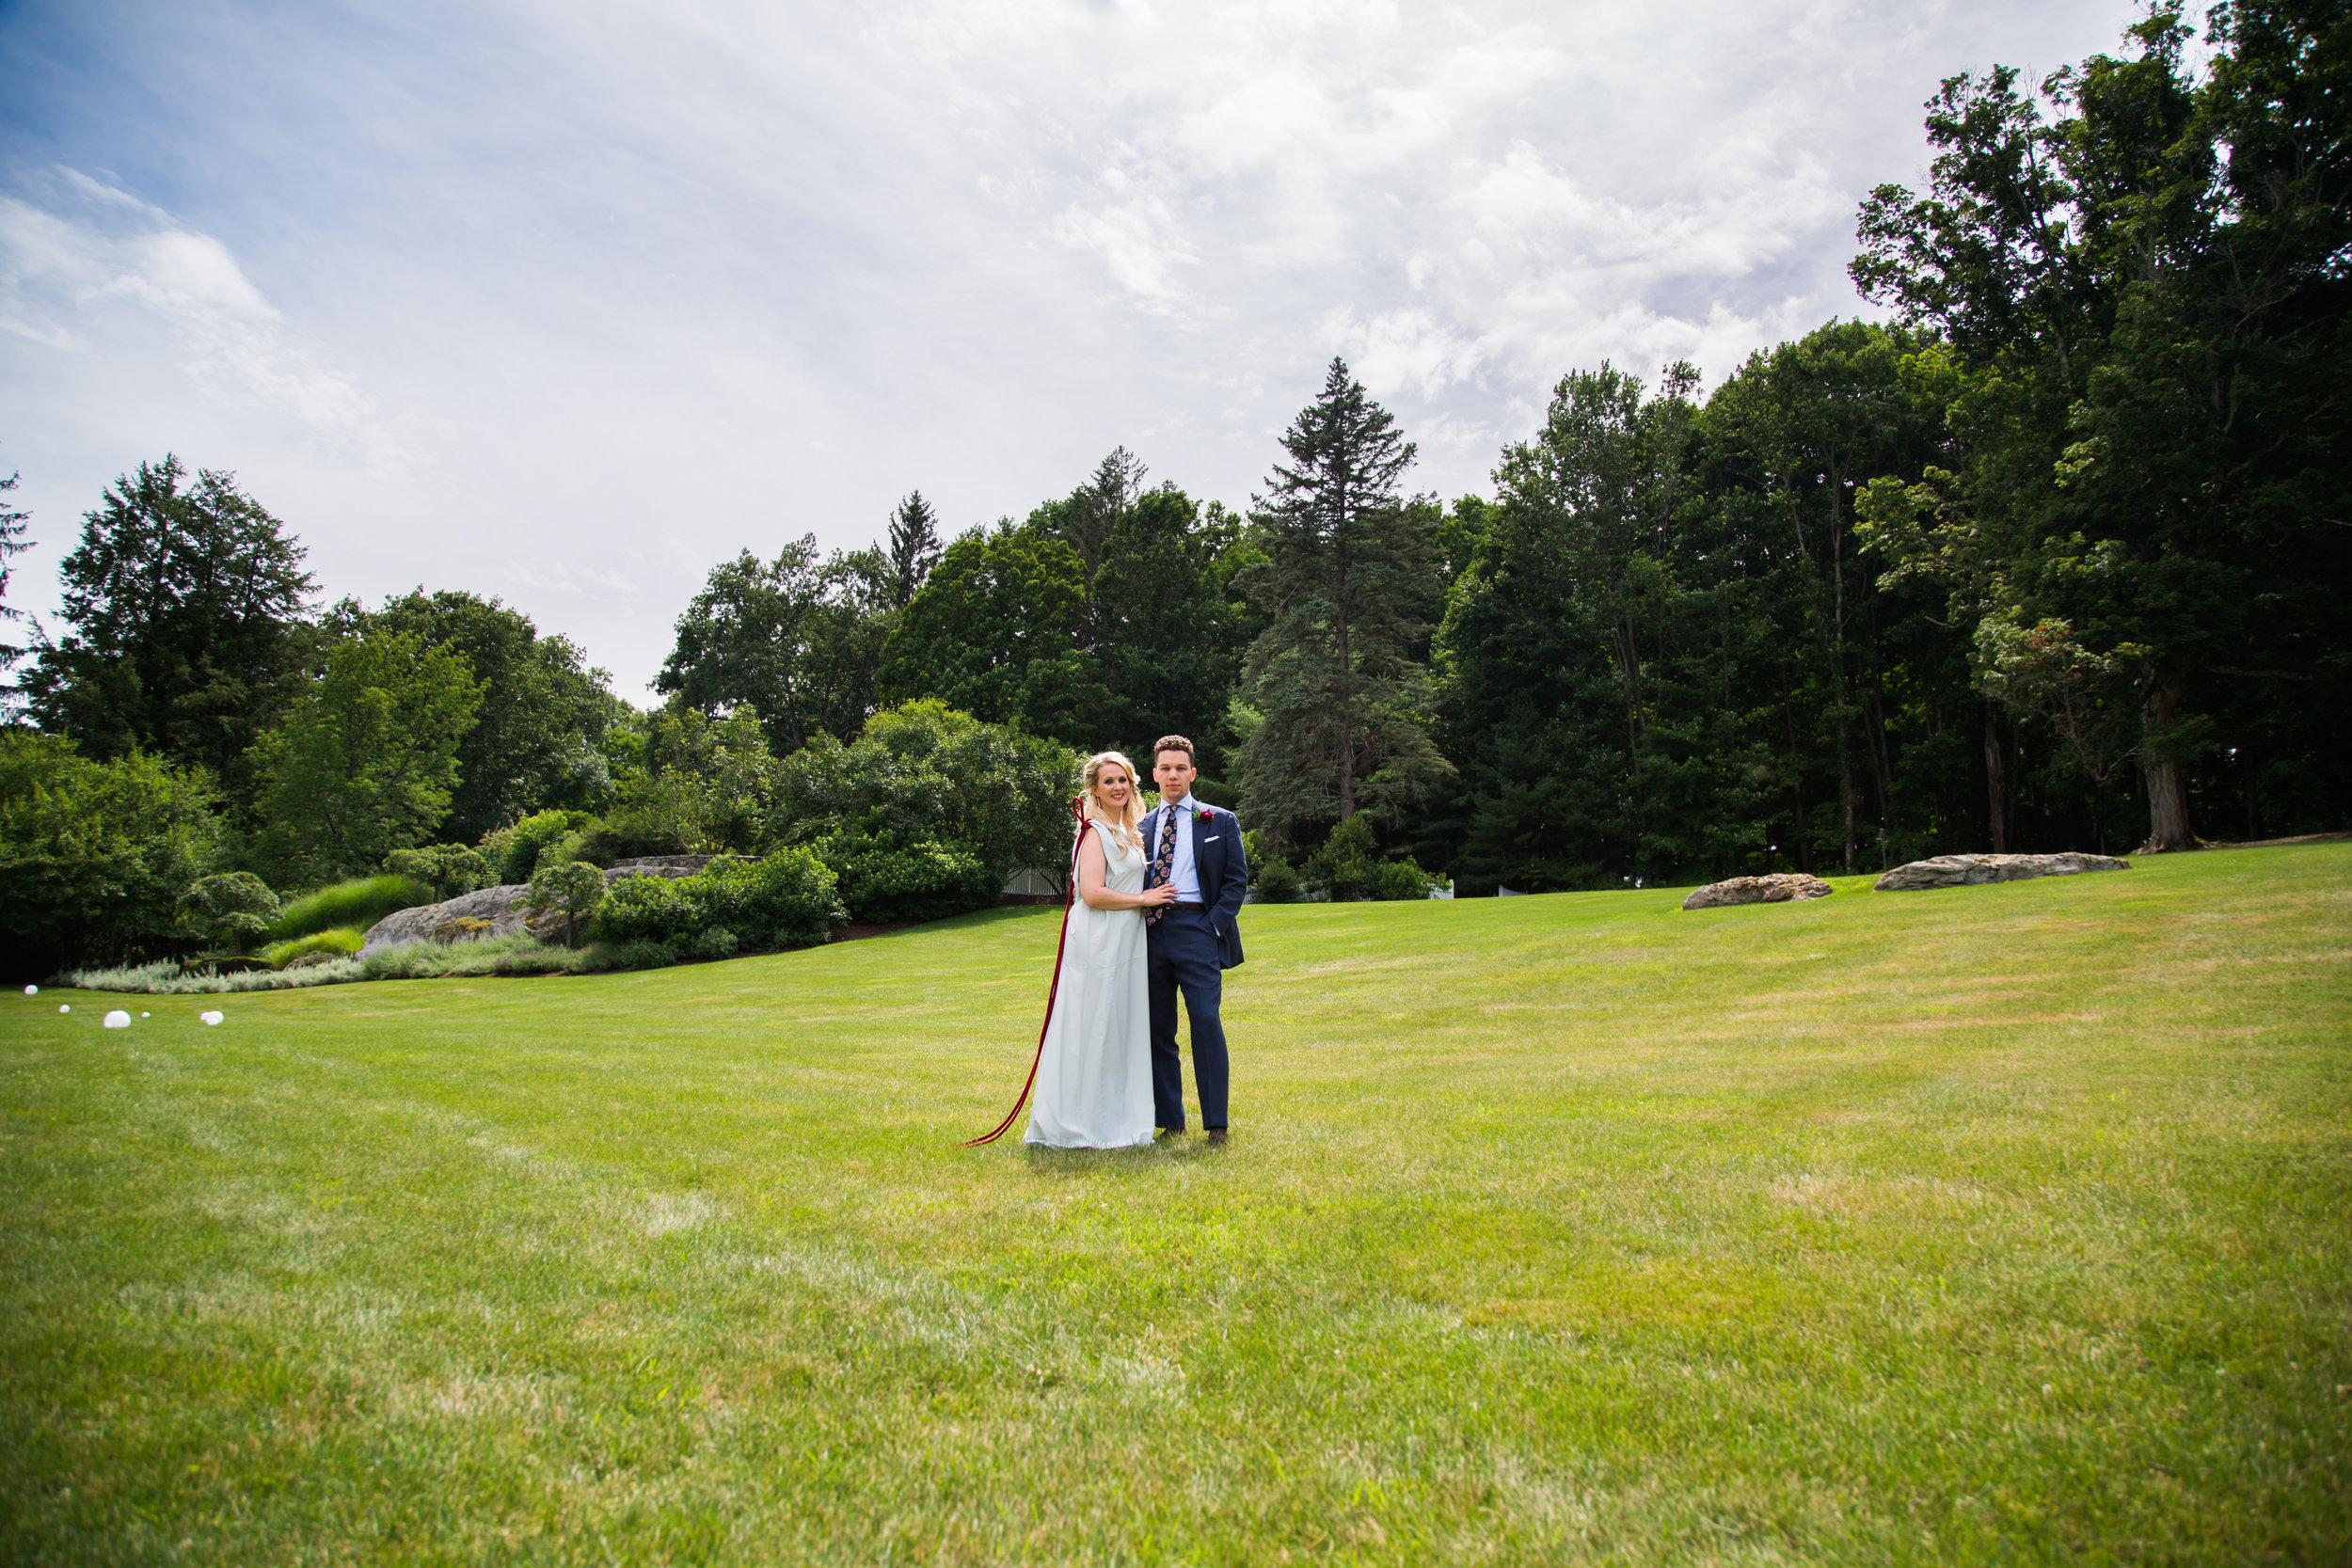 Julie-and-Peter-Wedding07212018-85.jpg